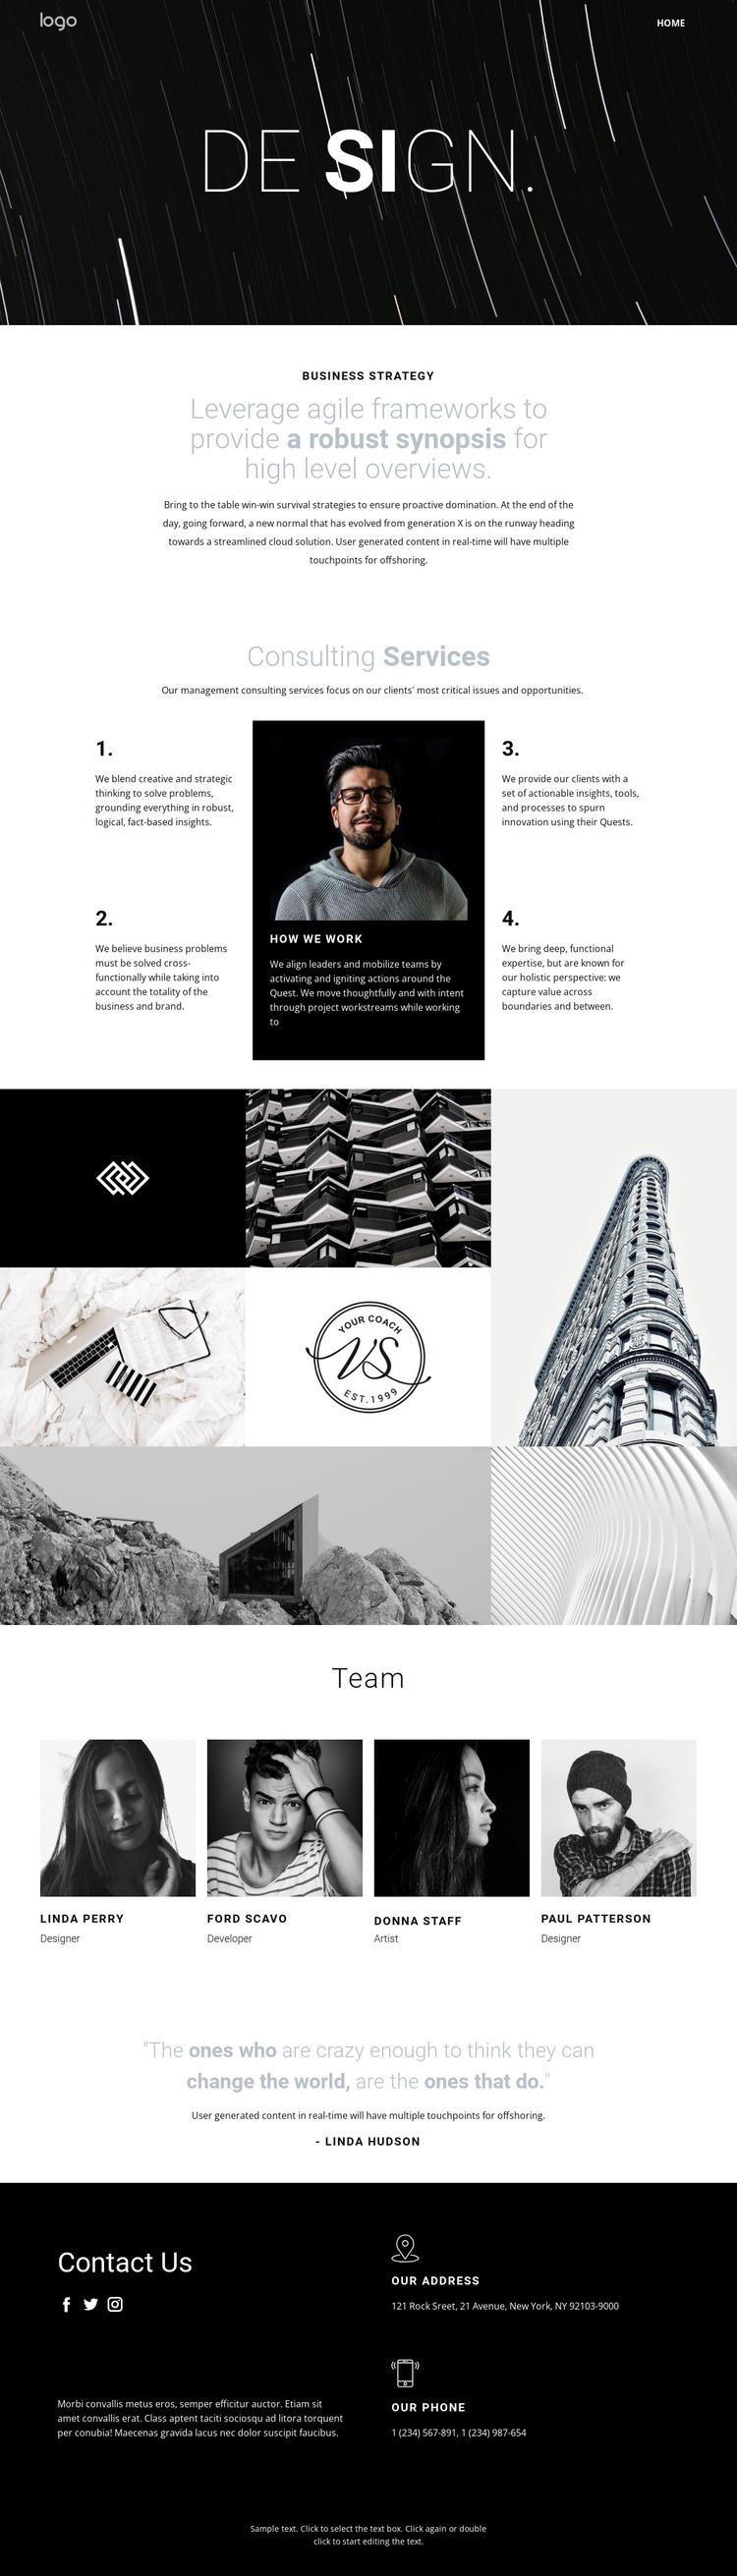 Design and creative art  HTML Template